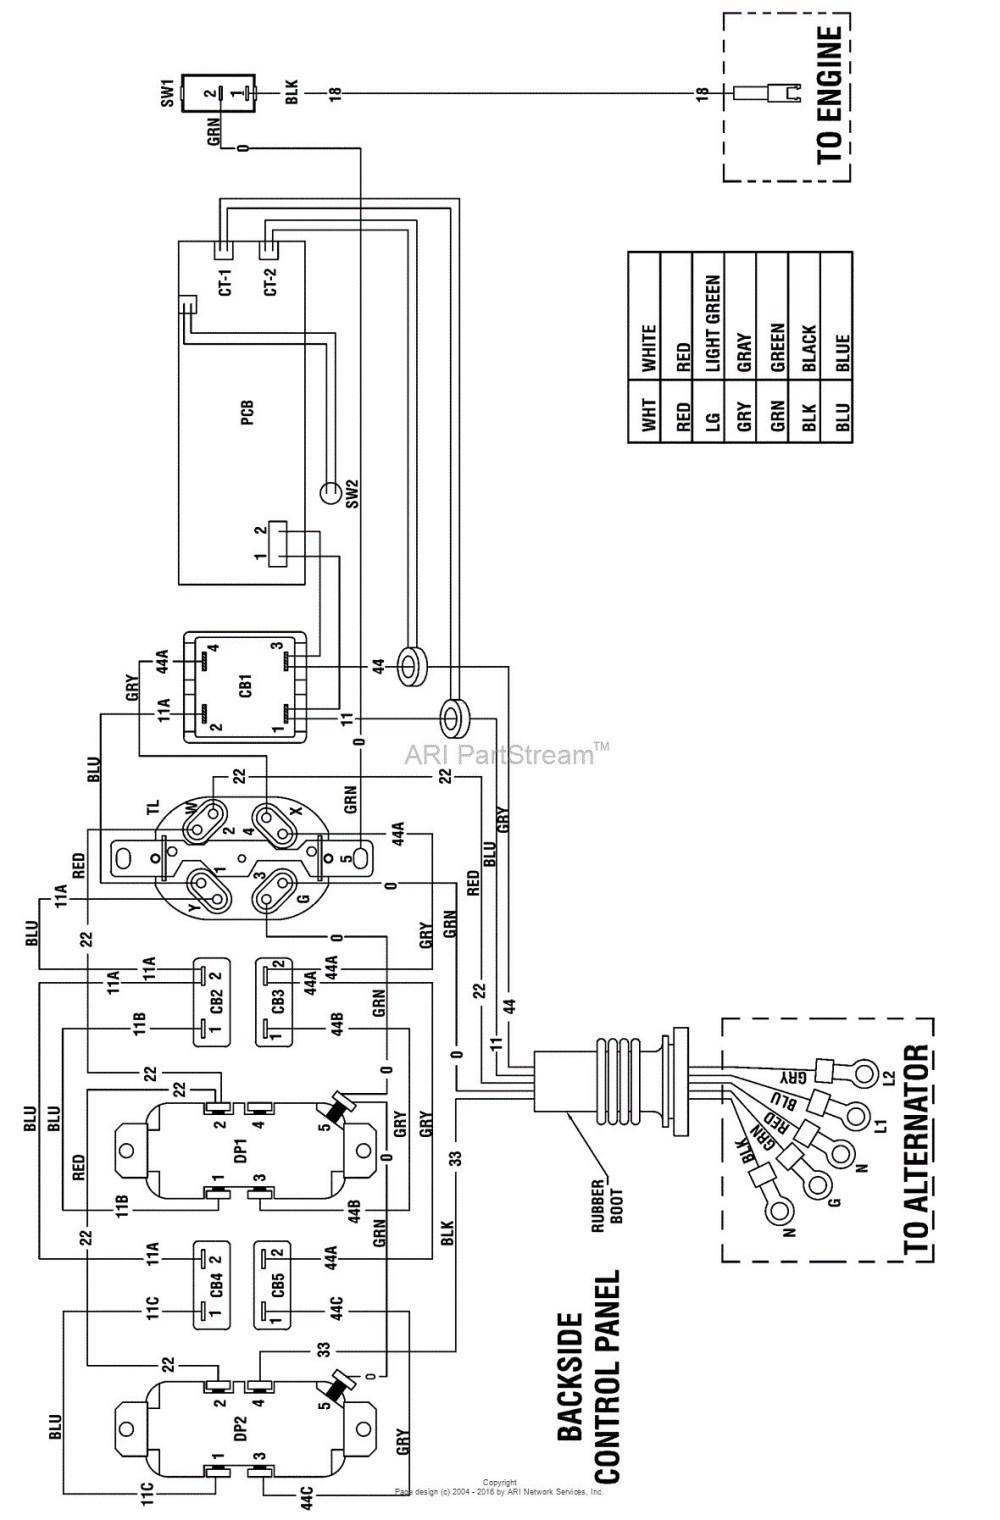 medium resolution of wiring diagram briggs stratton engine archives gidn co best incredible